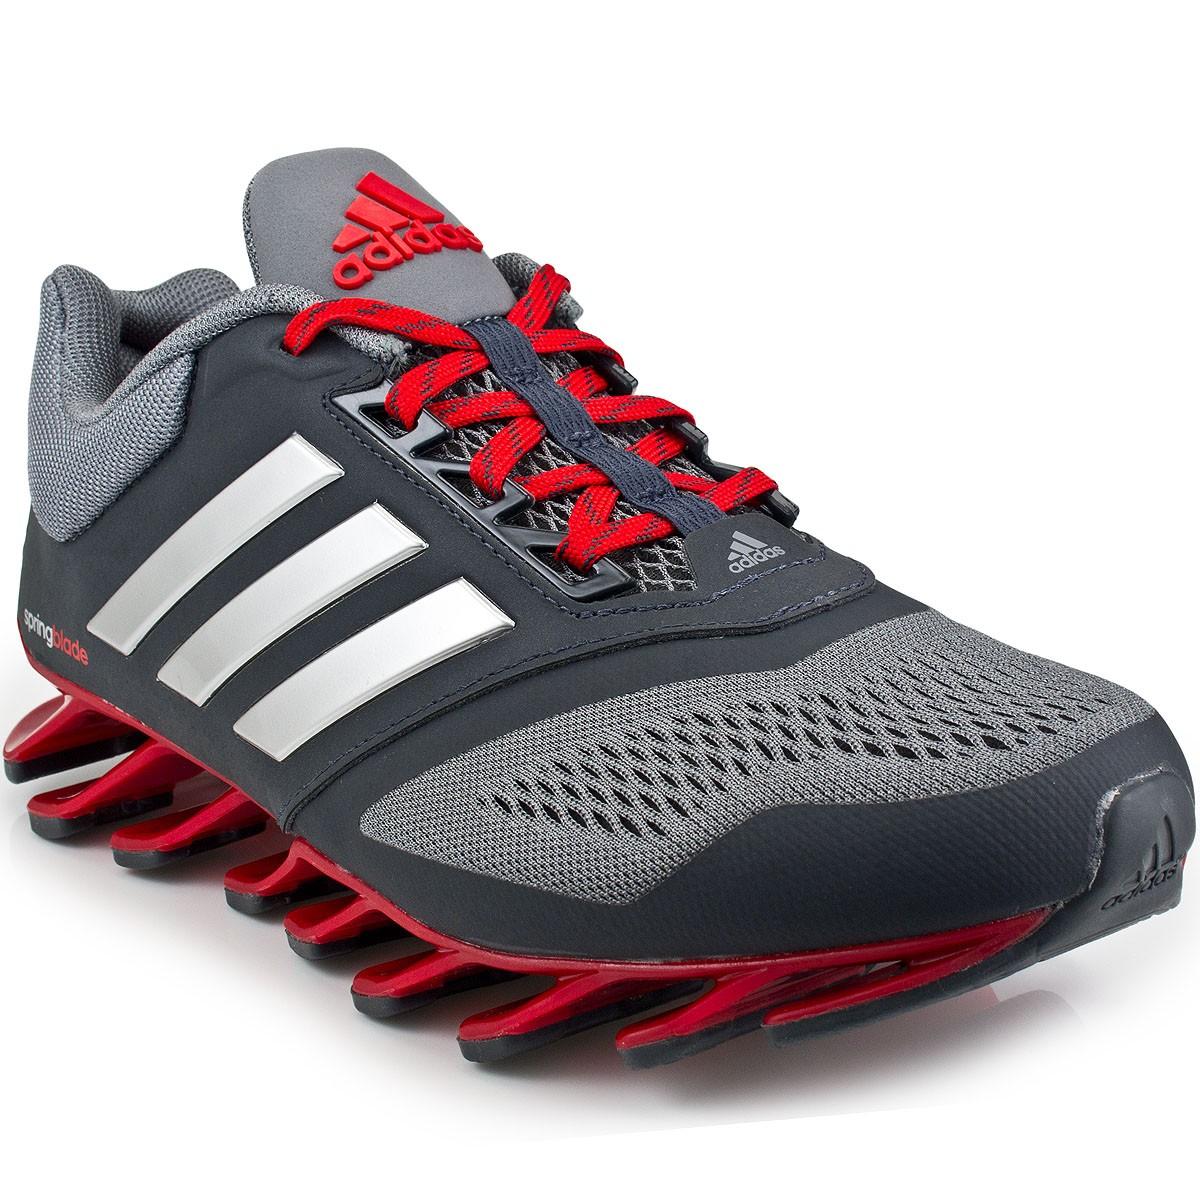 ebba89ec4fb8 Tênis Adidas Springblade Drive 2 M